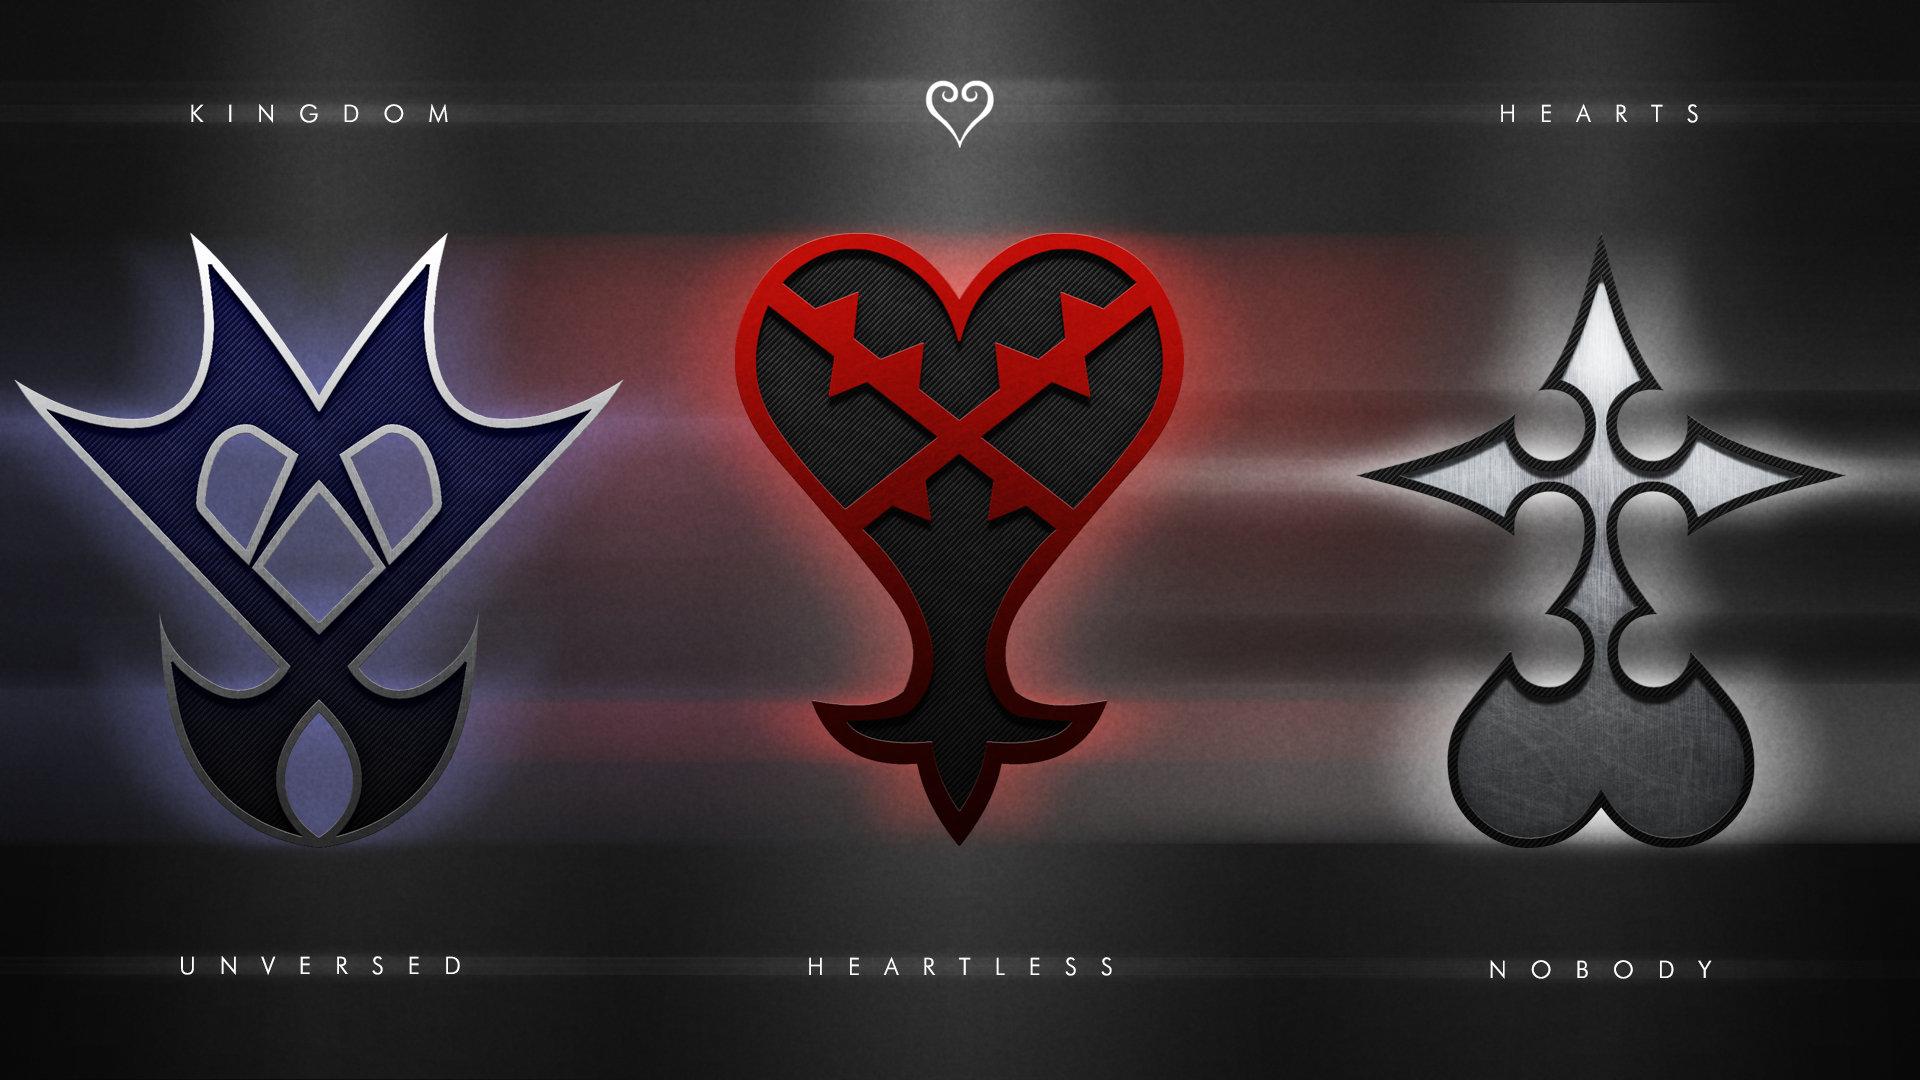 Kingdom Hearts Heartless wallpaper   1144002 1920x1080